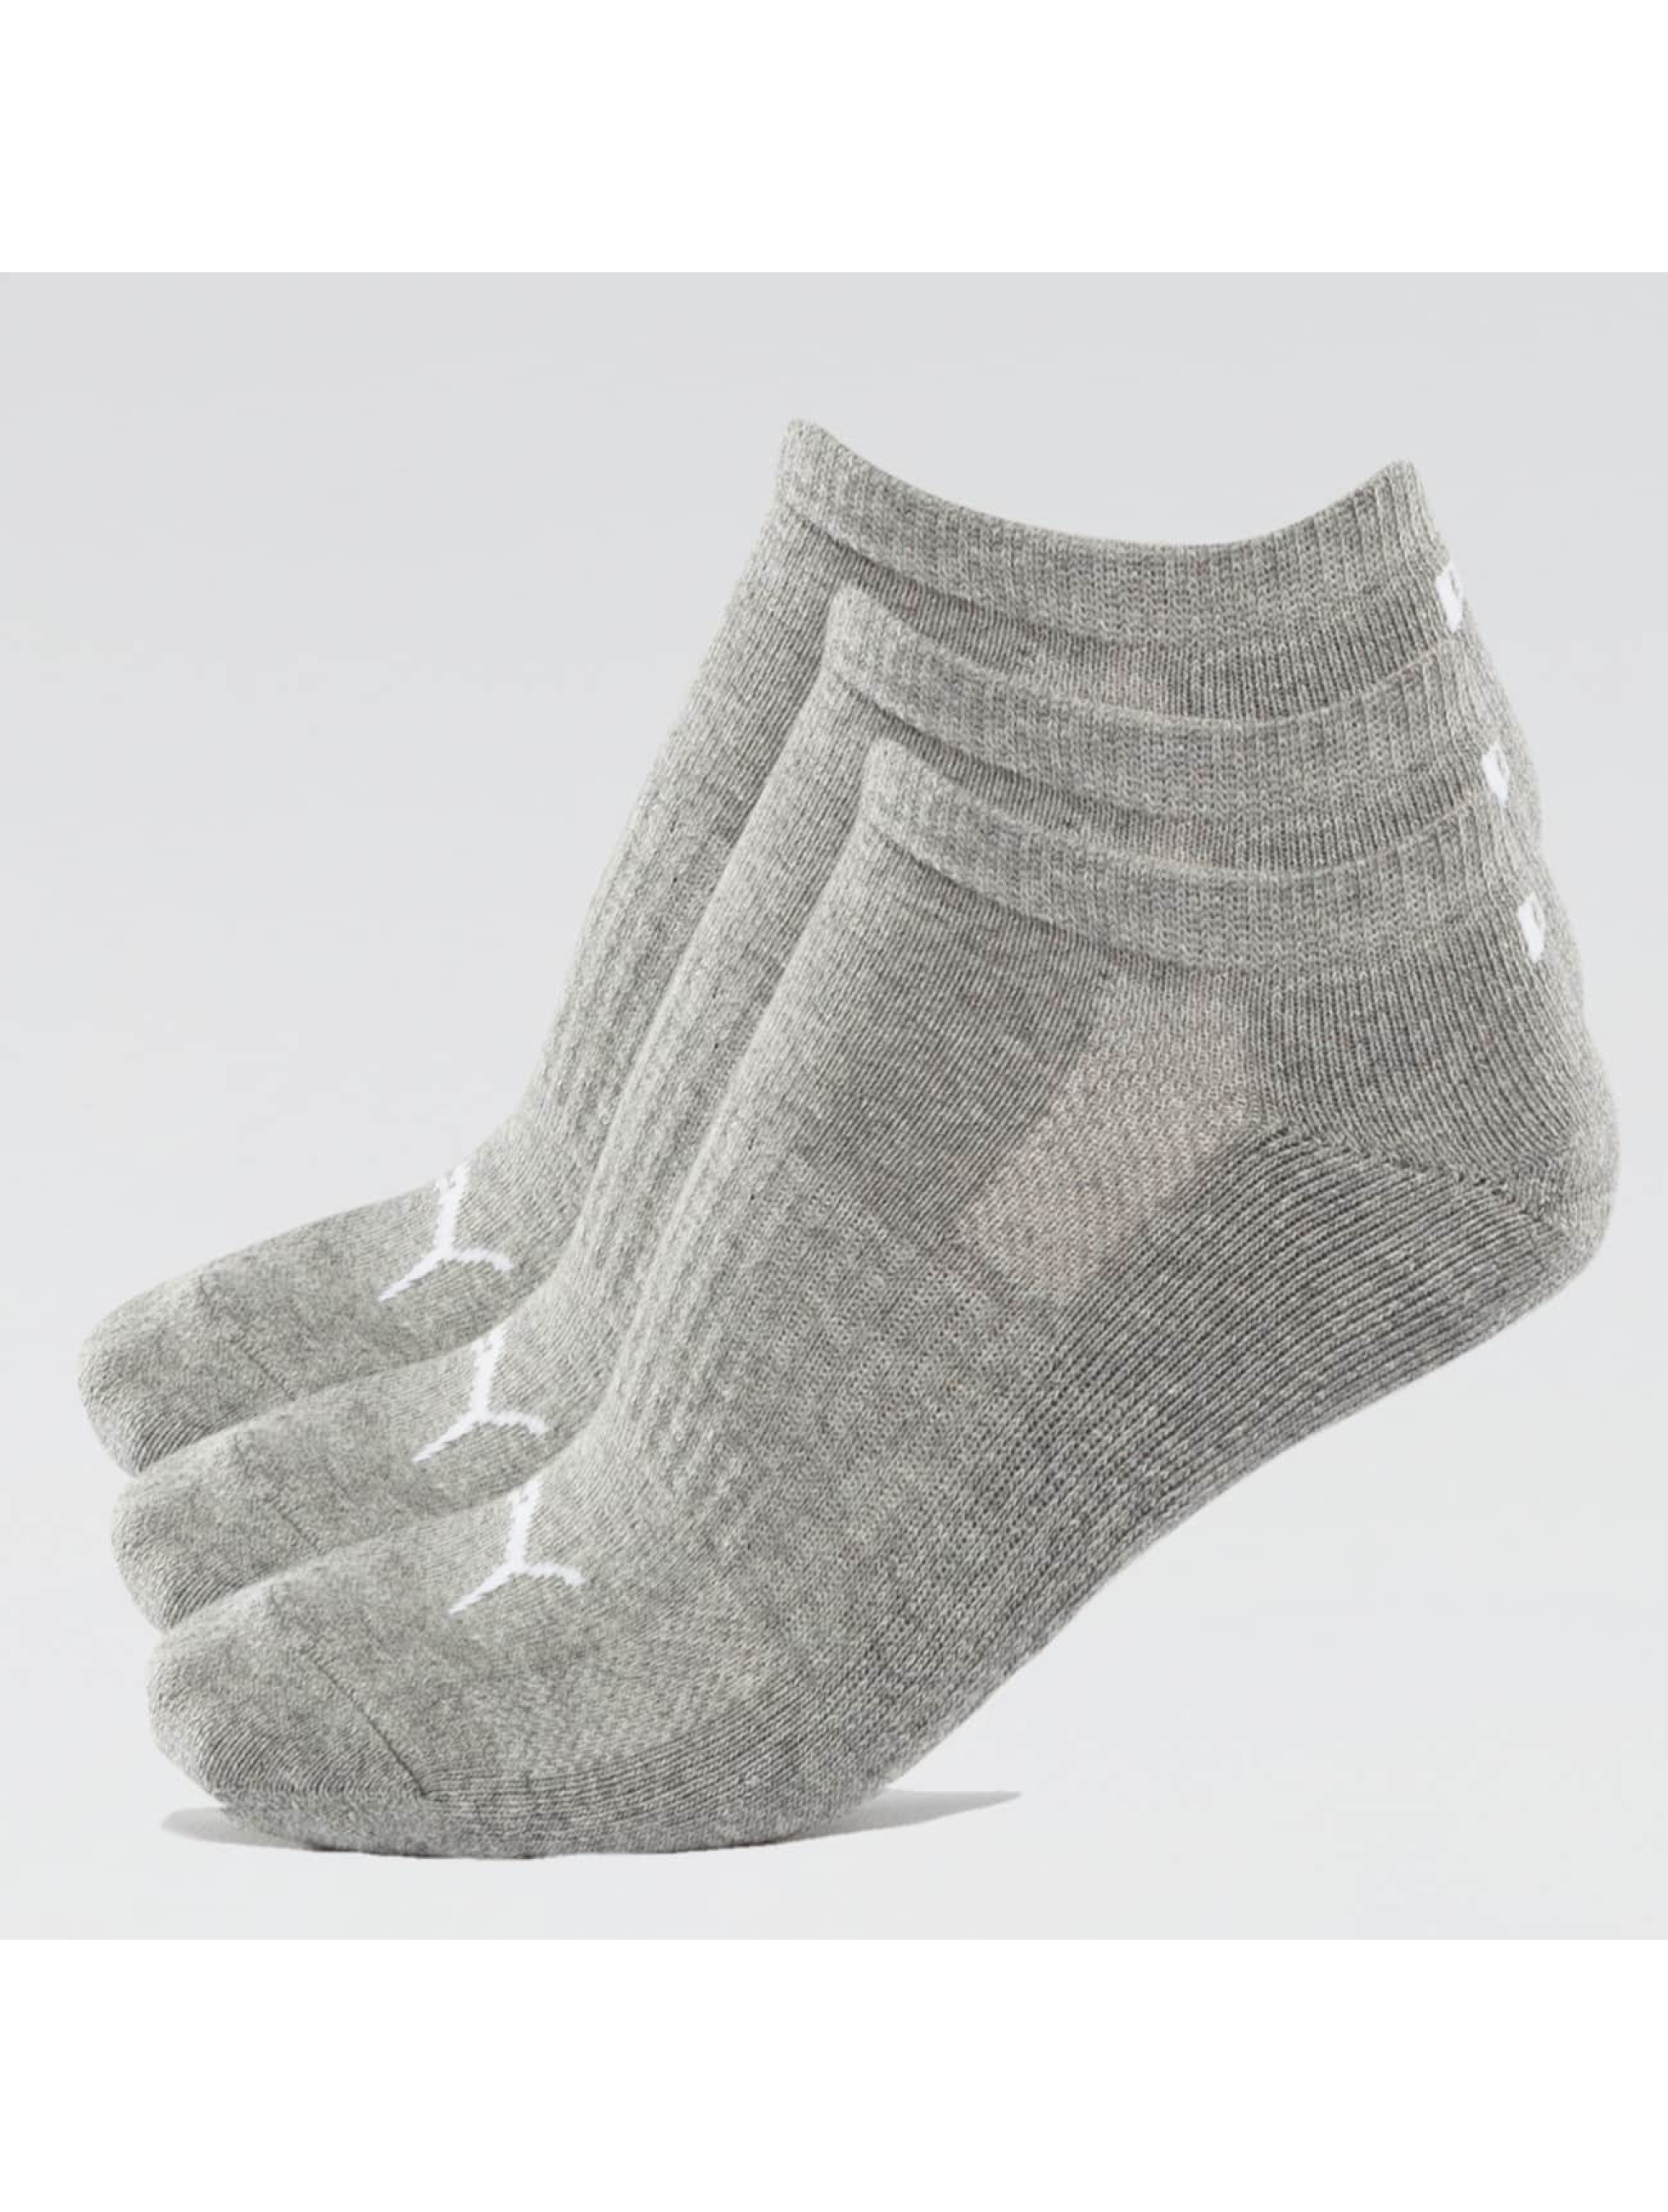 Puma Männer,Frauen Socken 2-Pack Cushioned Sneakers in grau